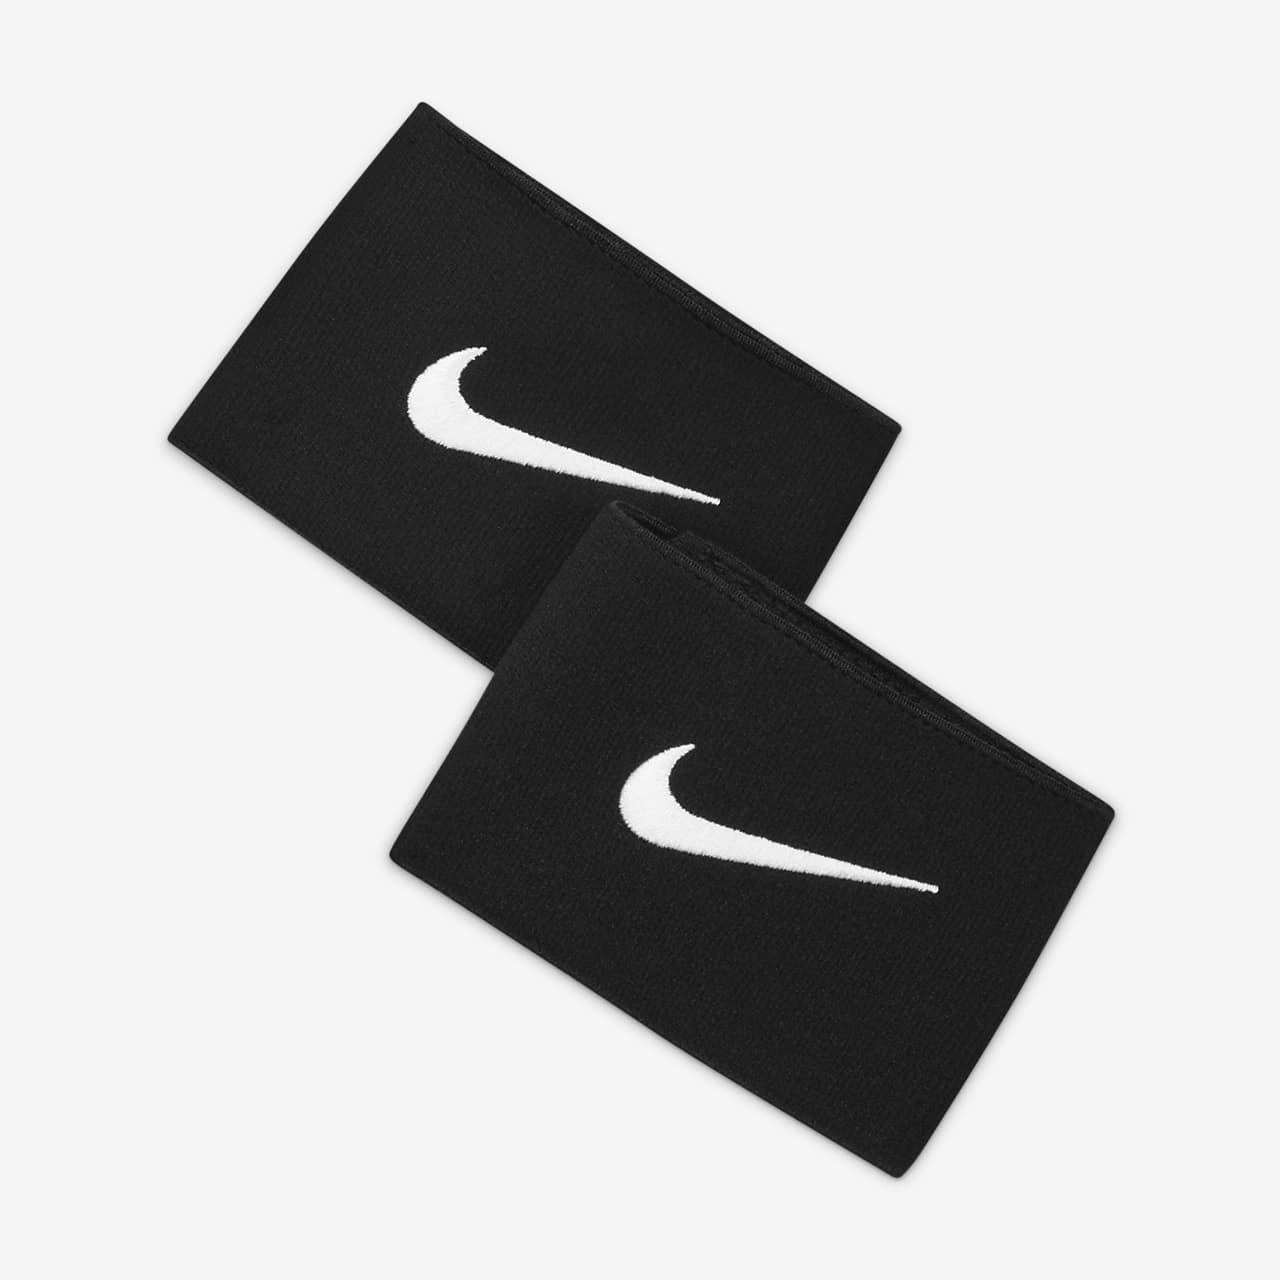 Fascette da calcio Nike Guard Stay II